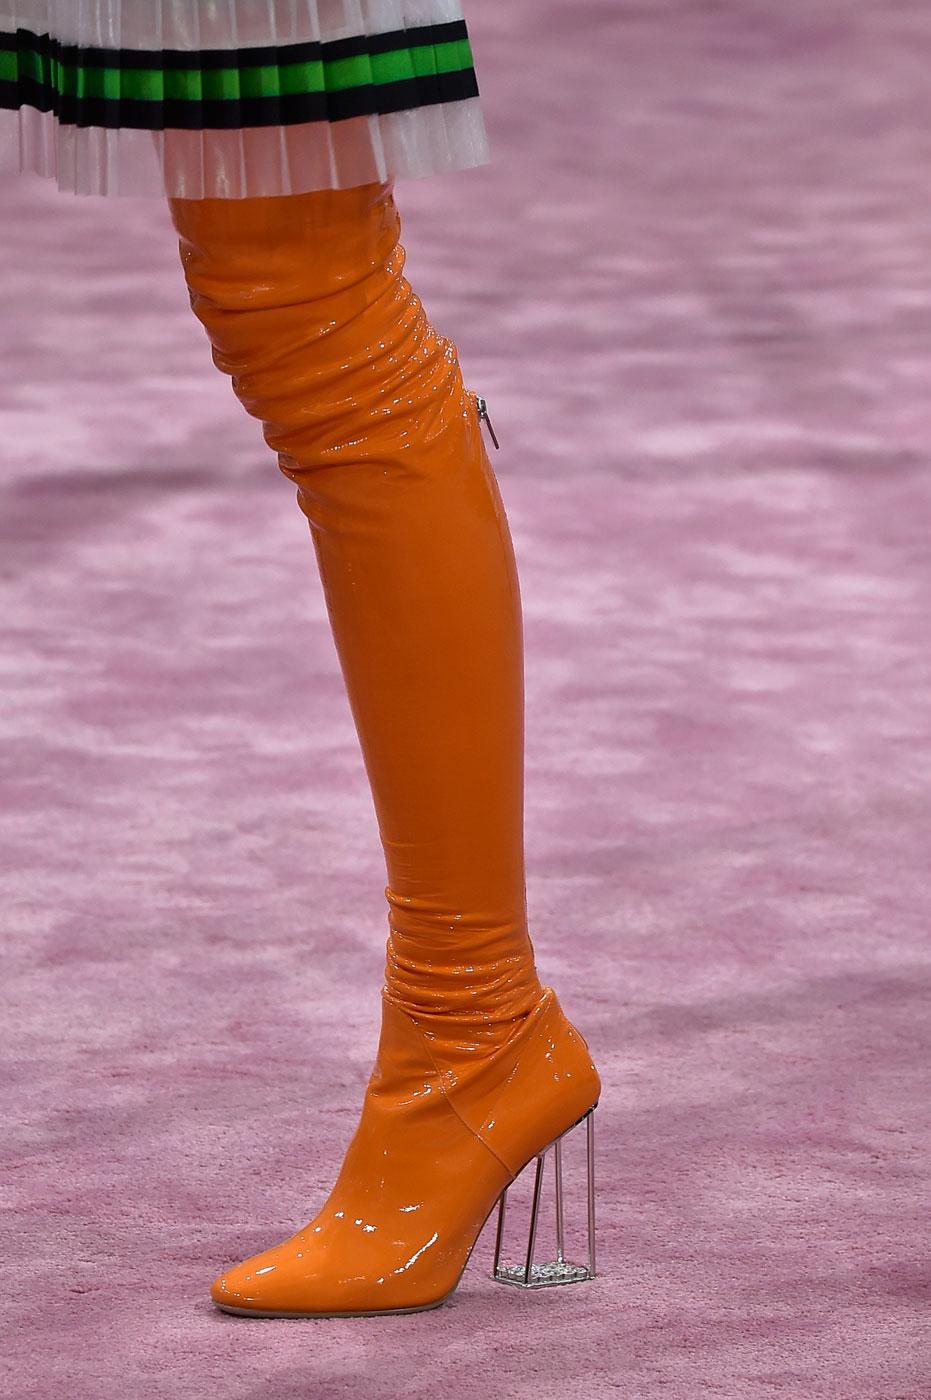 Christian-Dior-fashion-runway-show-close-ups-haute-couture-paris-spring-summer-2015-the-impression-153